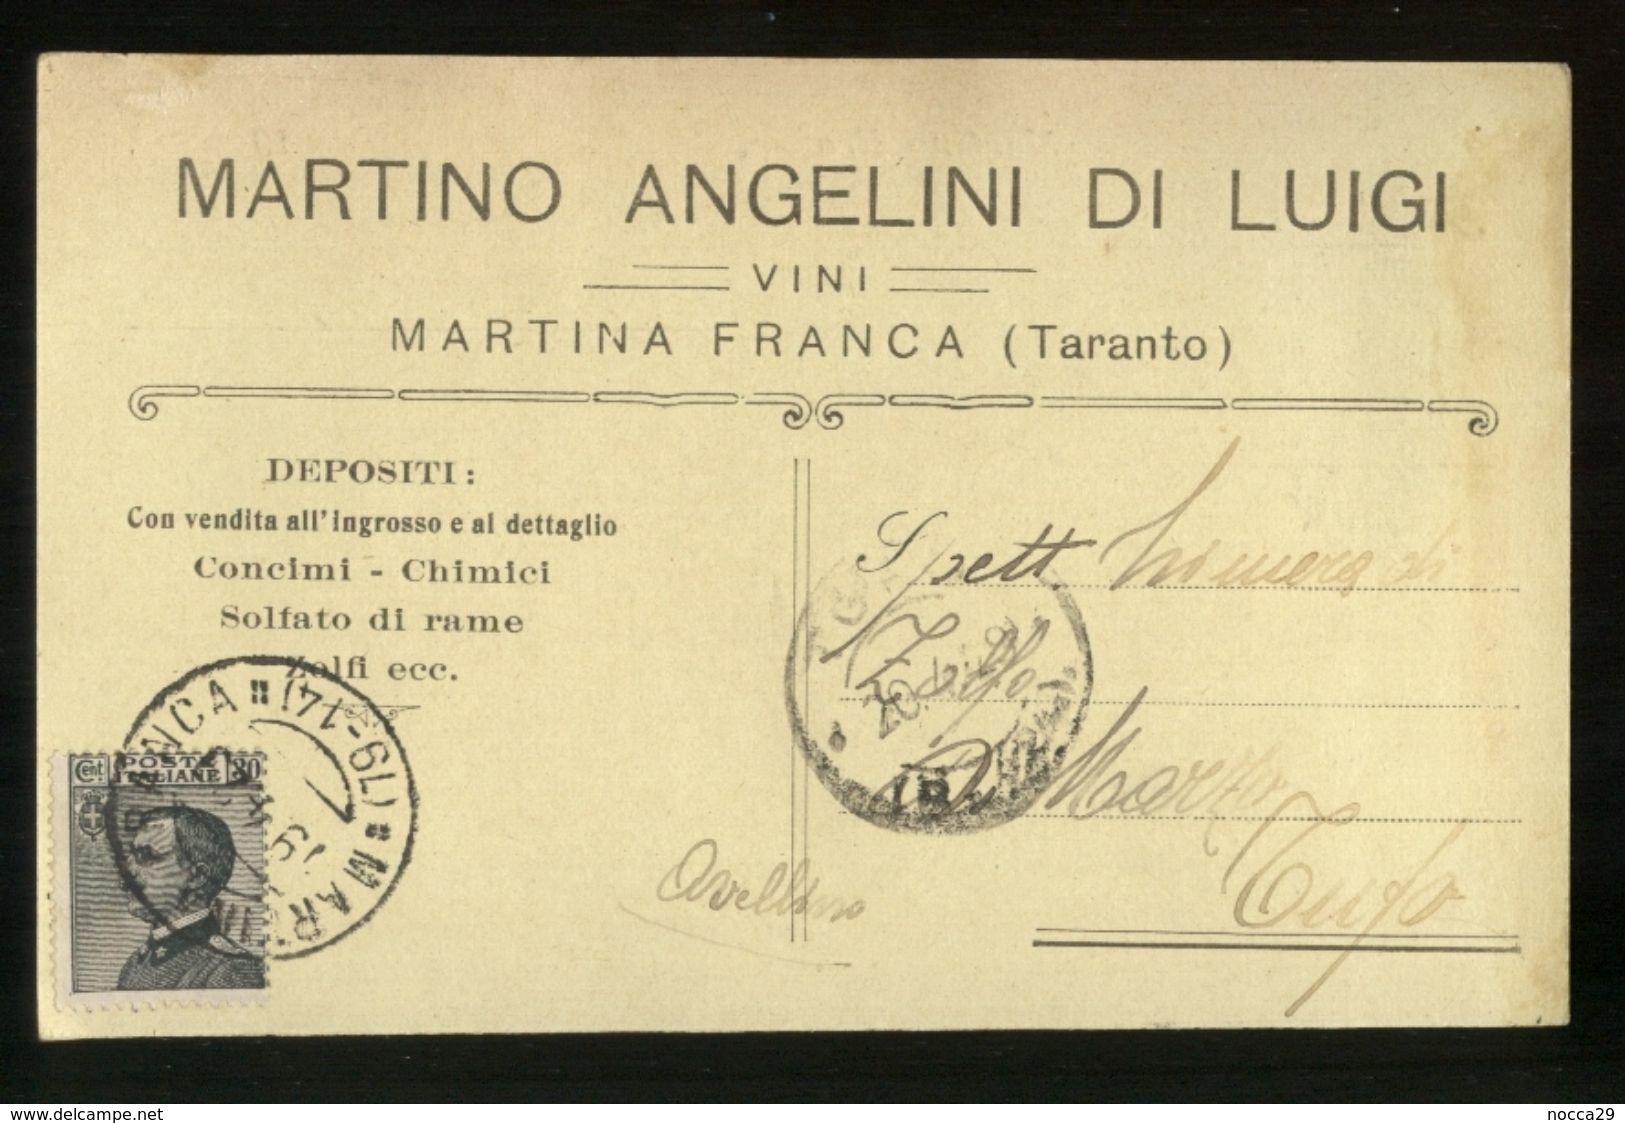 MARTINA FRANCA - TARANTO  - 1929 - CARTOLINA COMMERCIALE - MARTINO ANGELINI -  VINI - Negozi